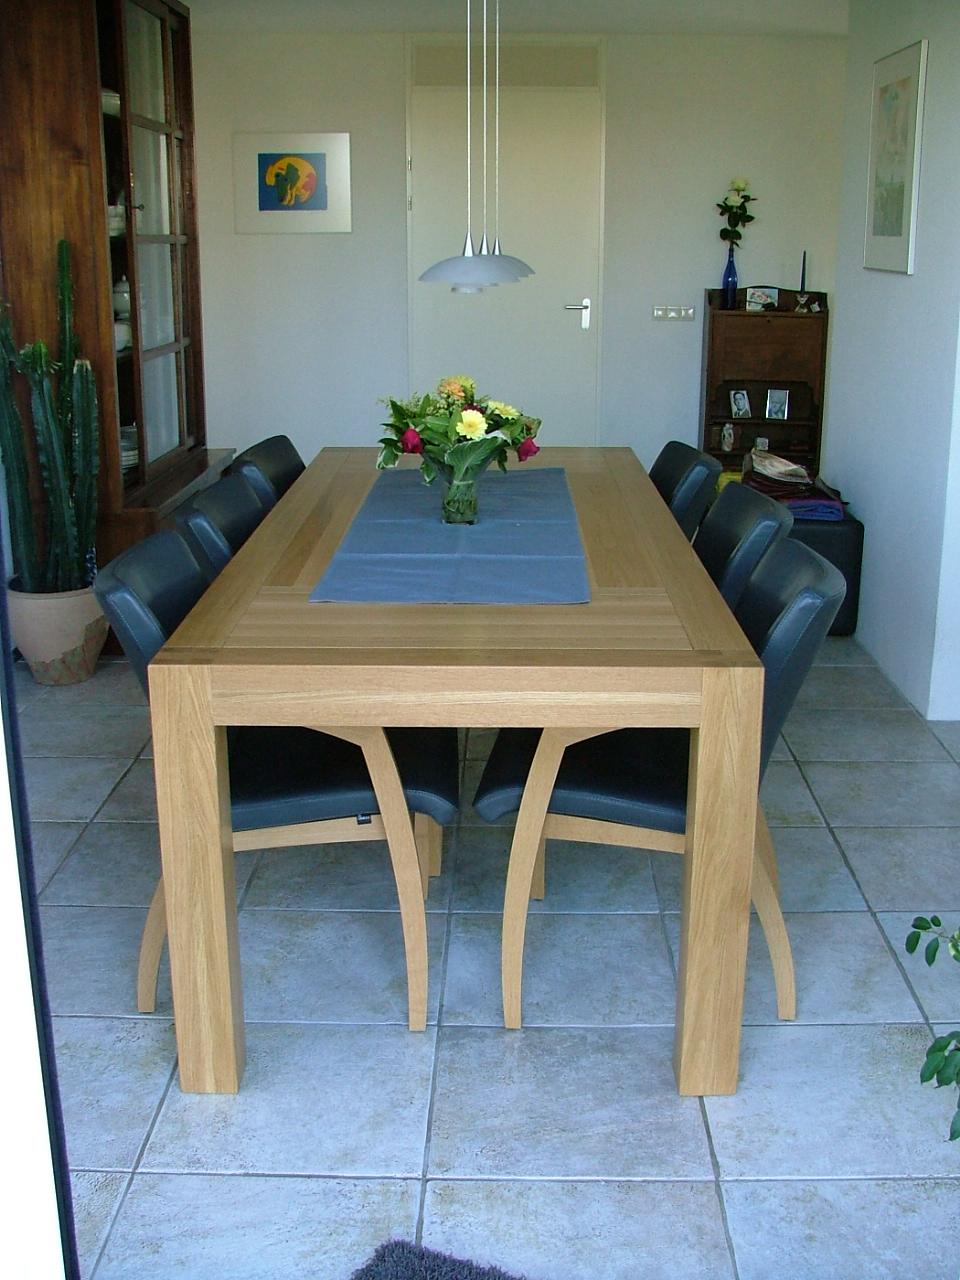 Grote eetkamer tafel op maat gemaakt van massief